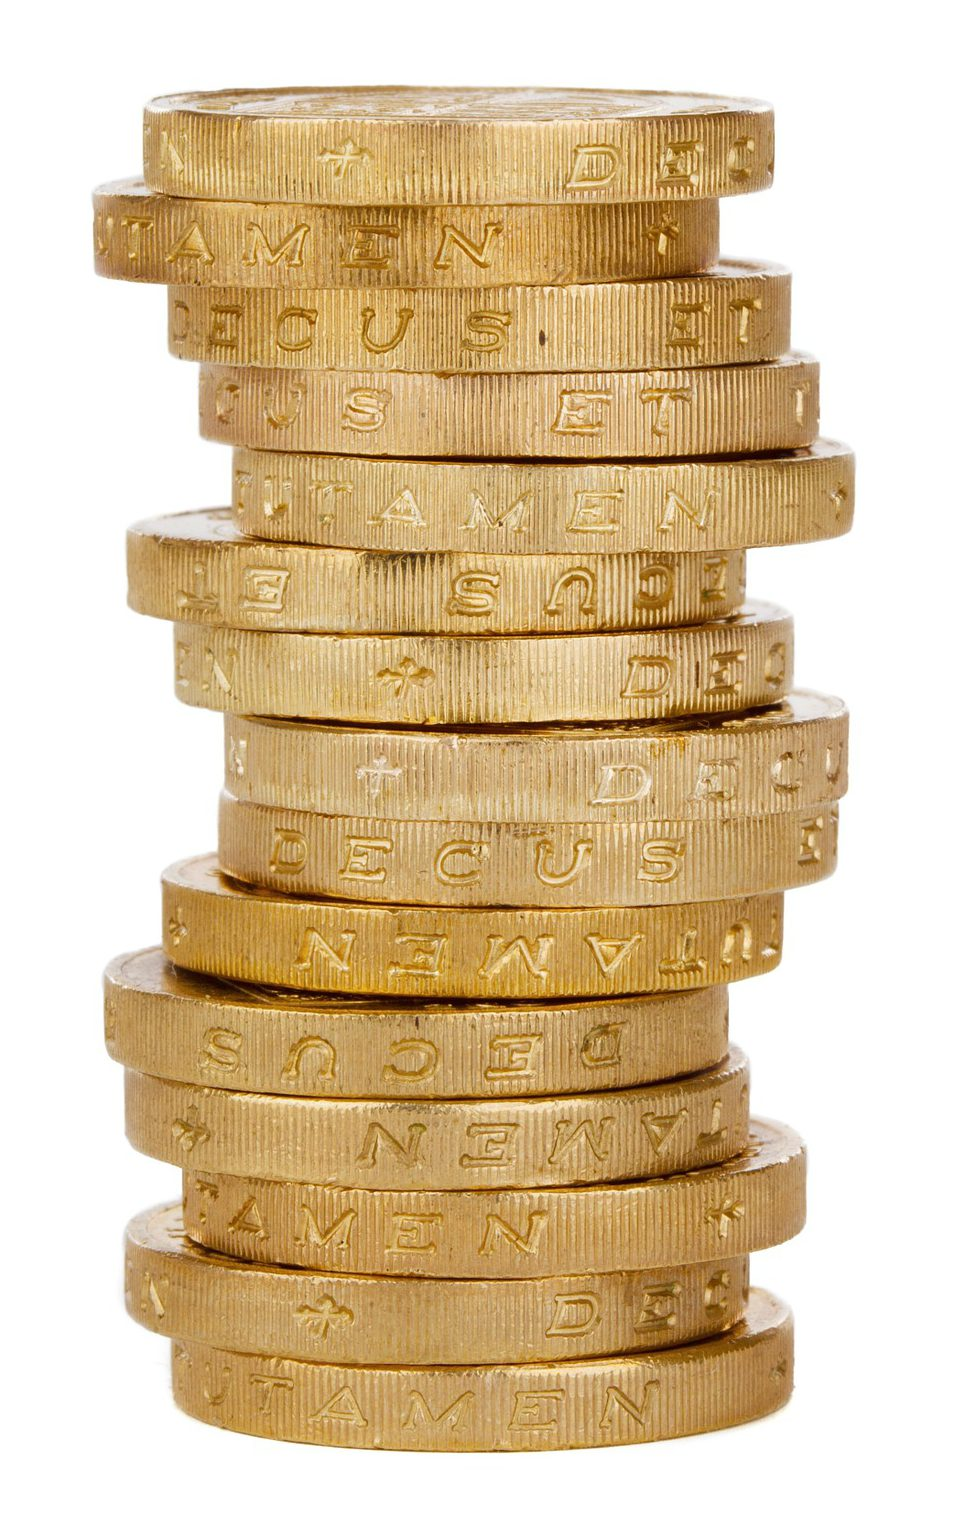 Tutoring insurance cost